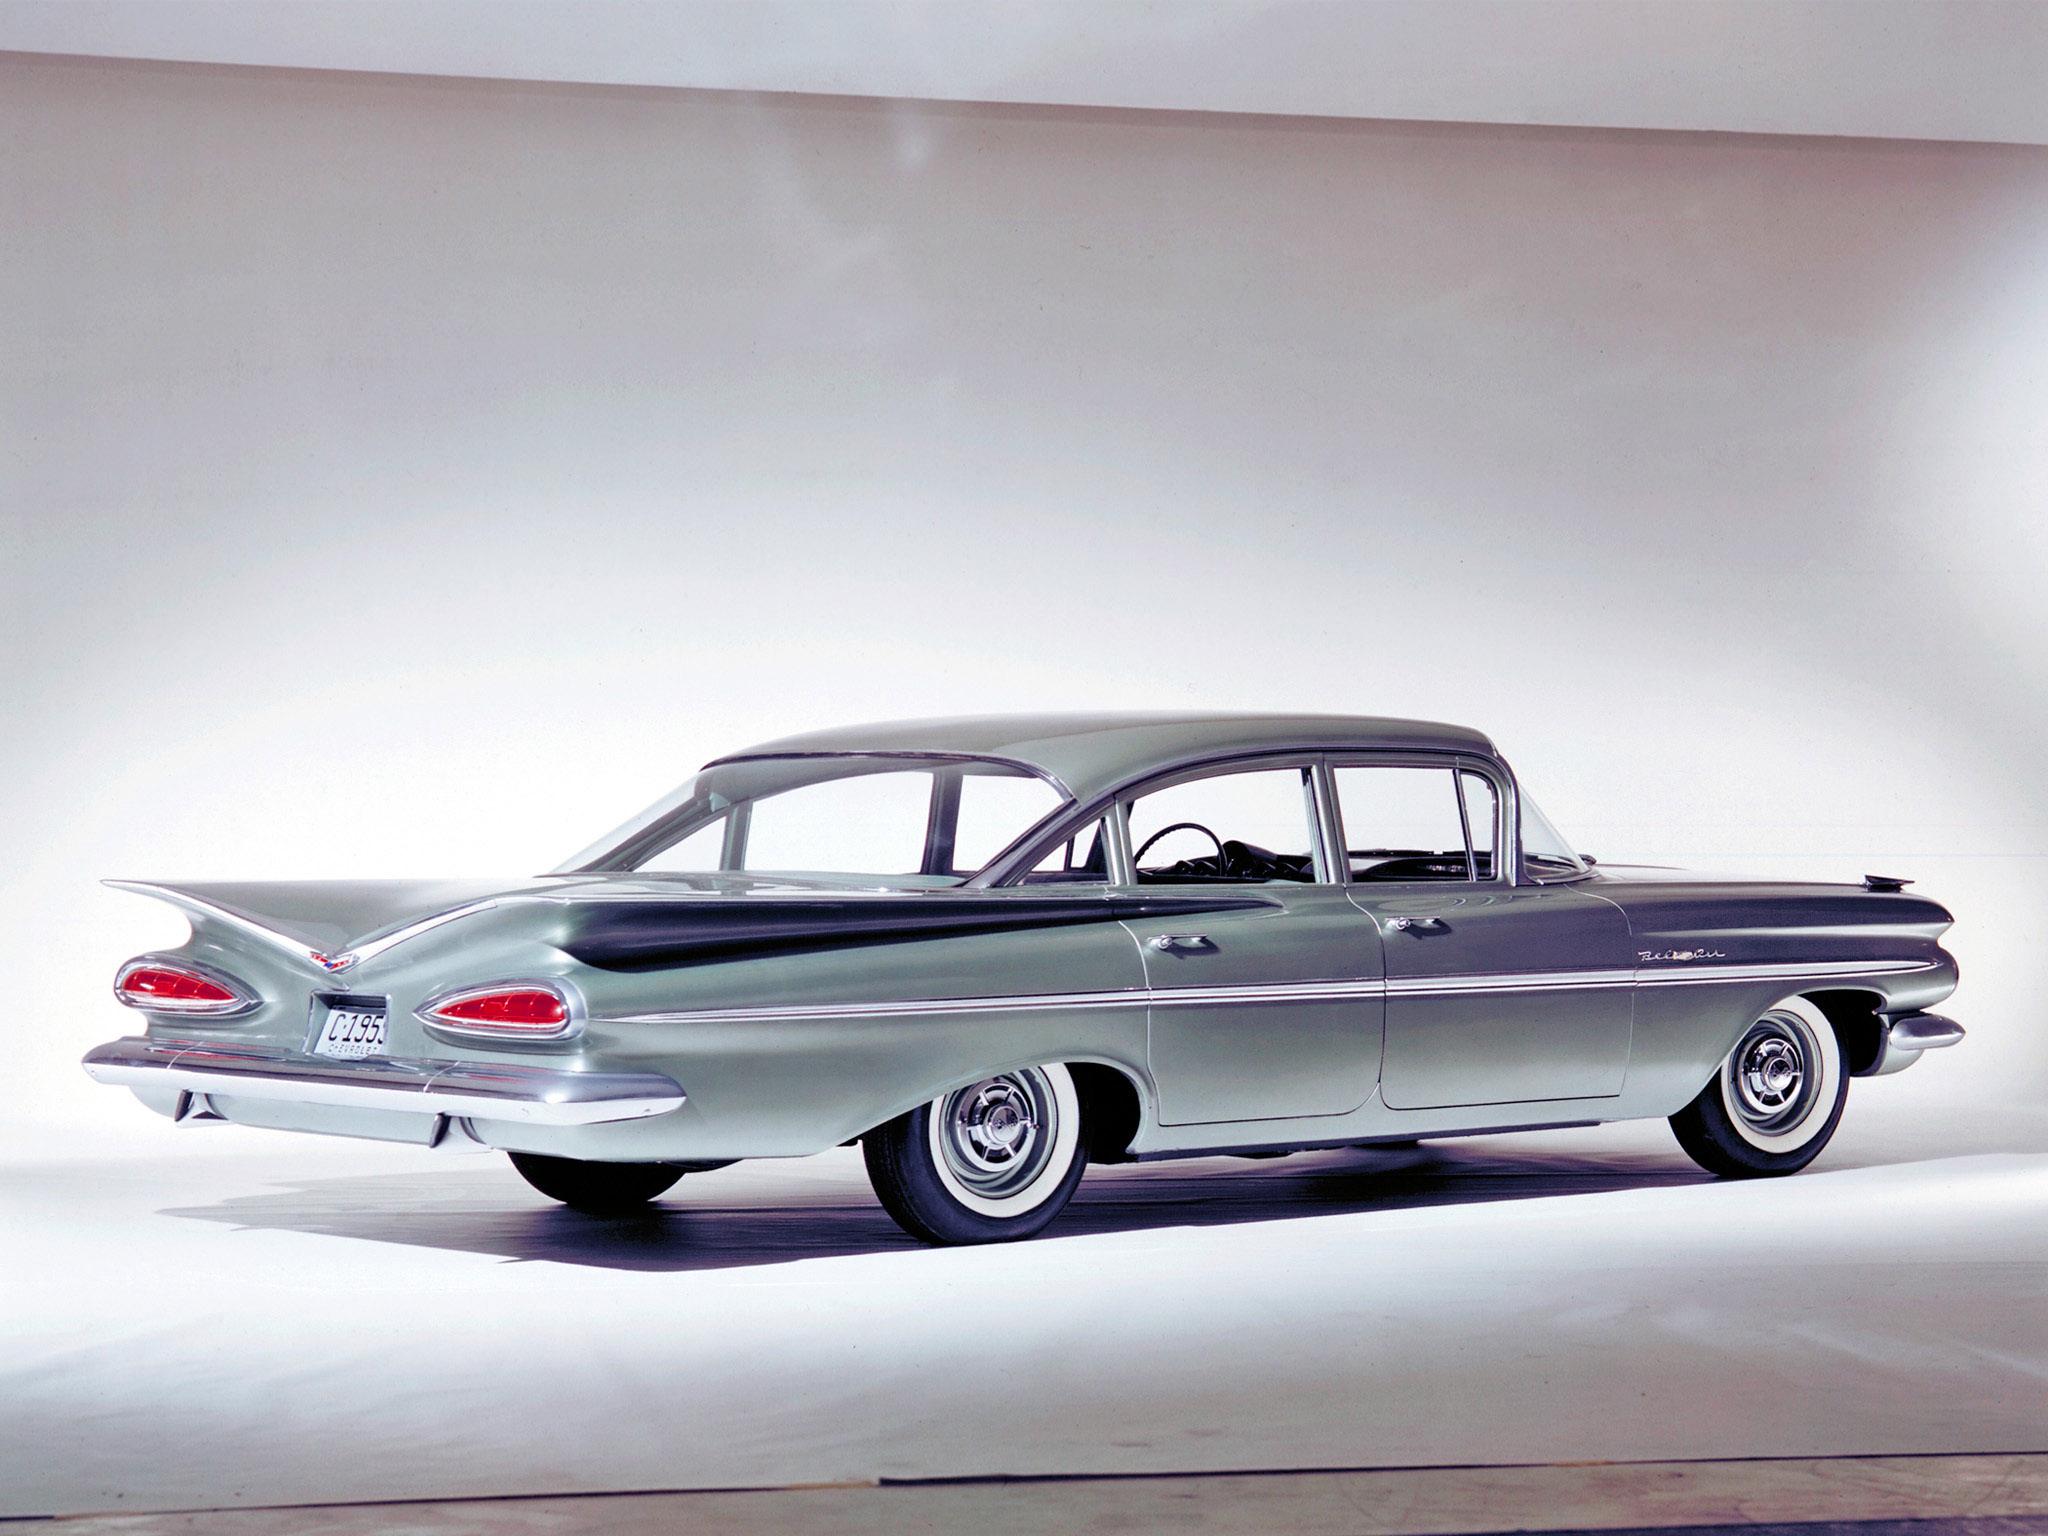 1959 chevrolet bel air 4 door sedan retro gf wallpaper. Black Bedroom Furniture Sets. Home Design Ideas